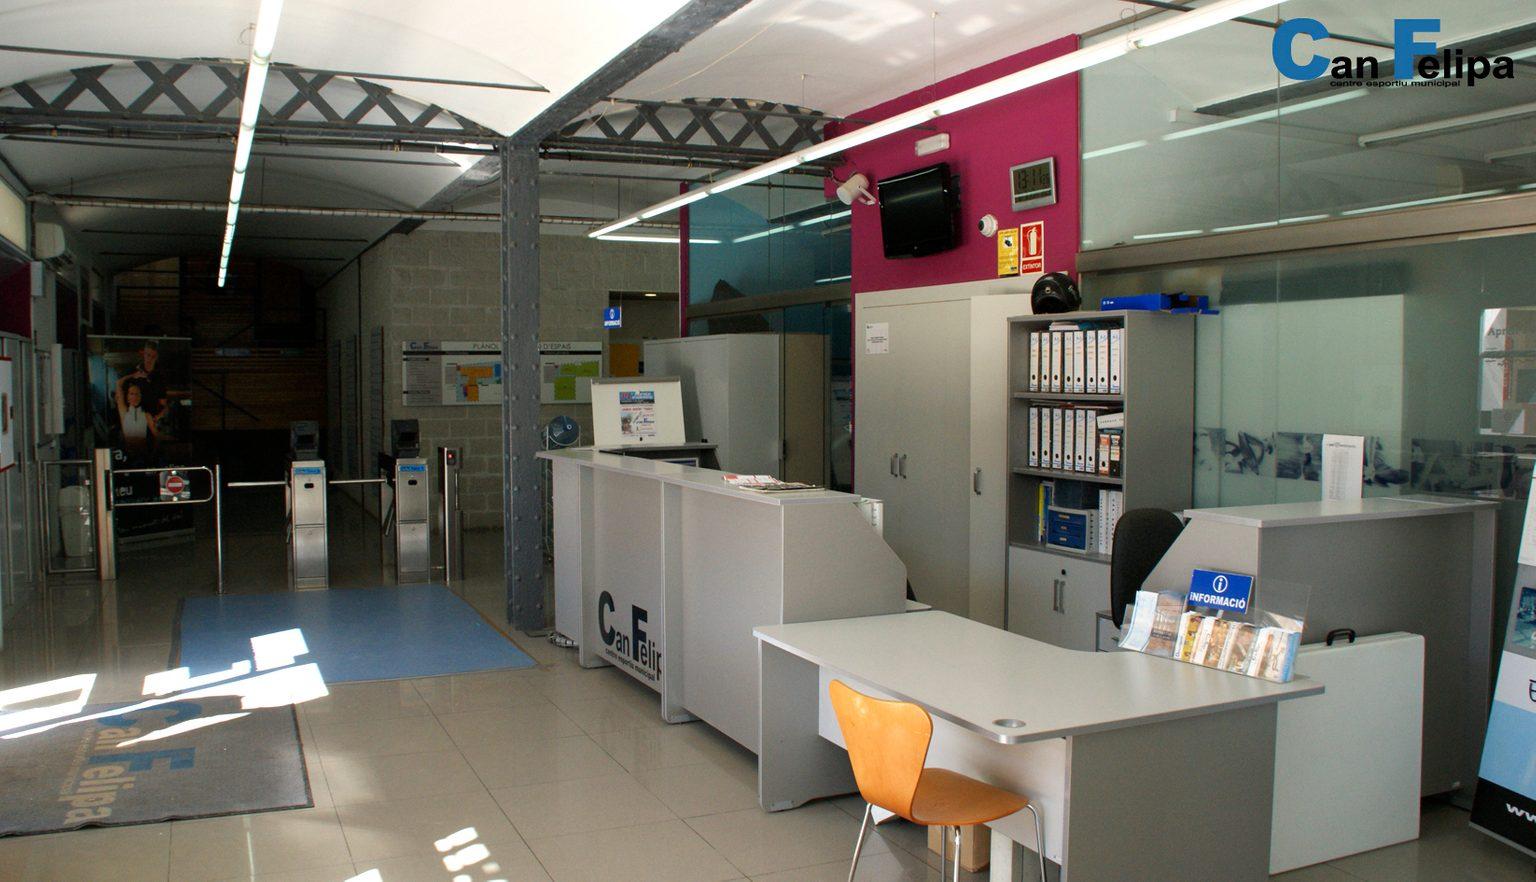 Photo from Centre Esportiu Municipal Can Felipa